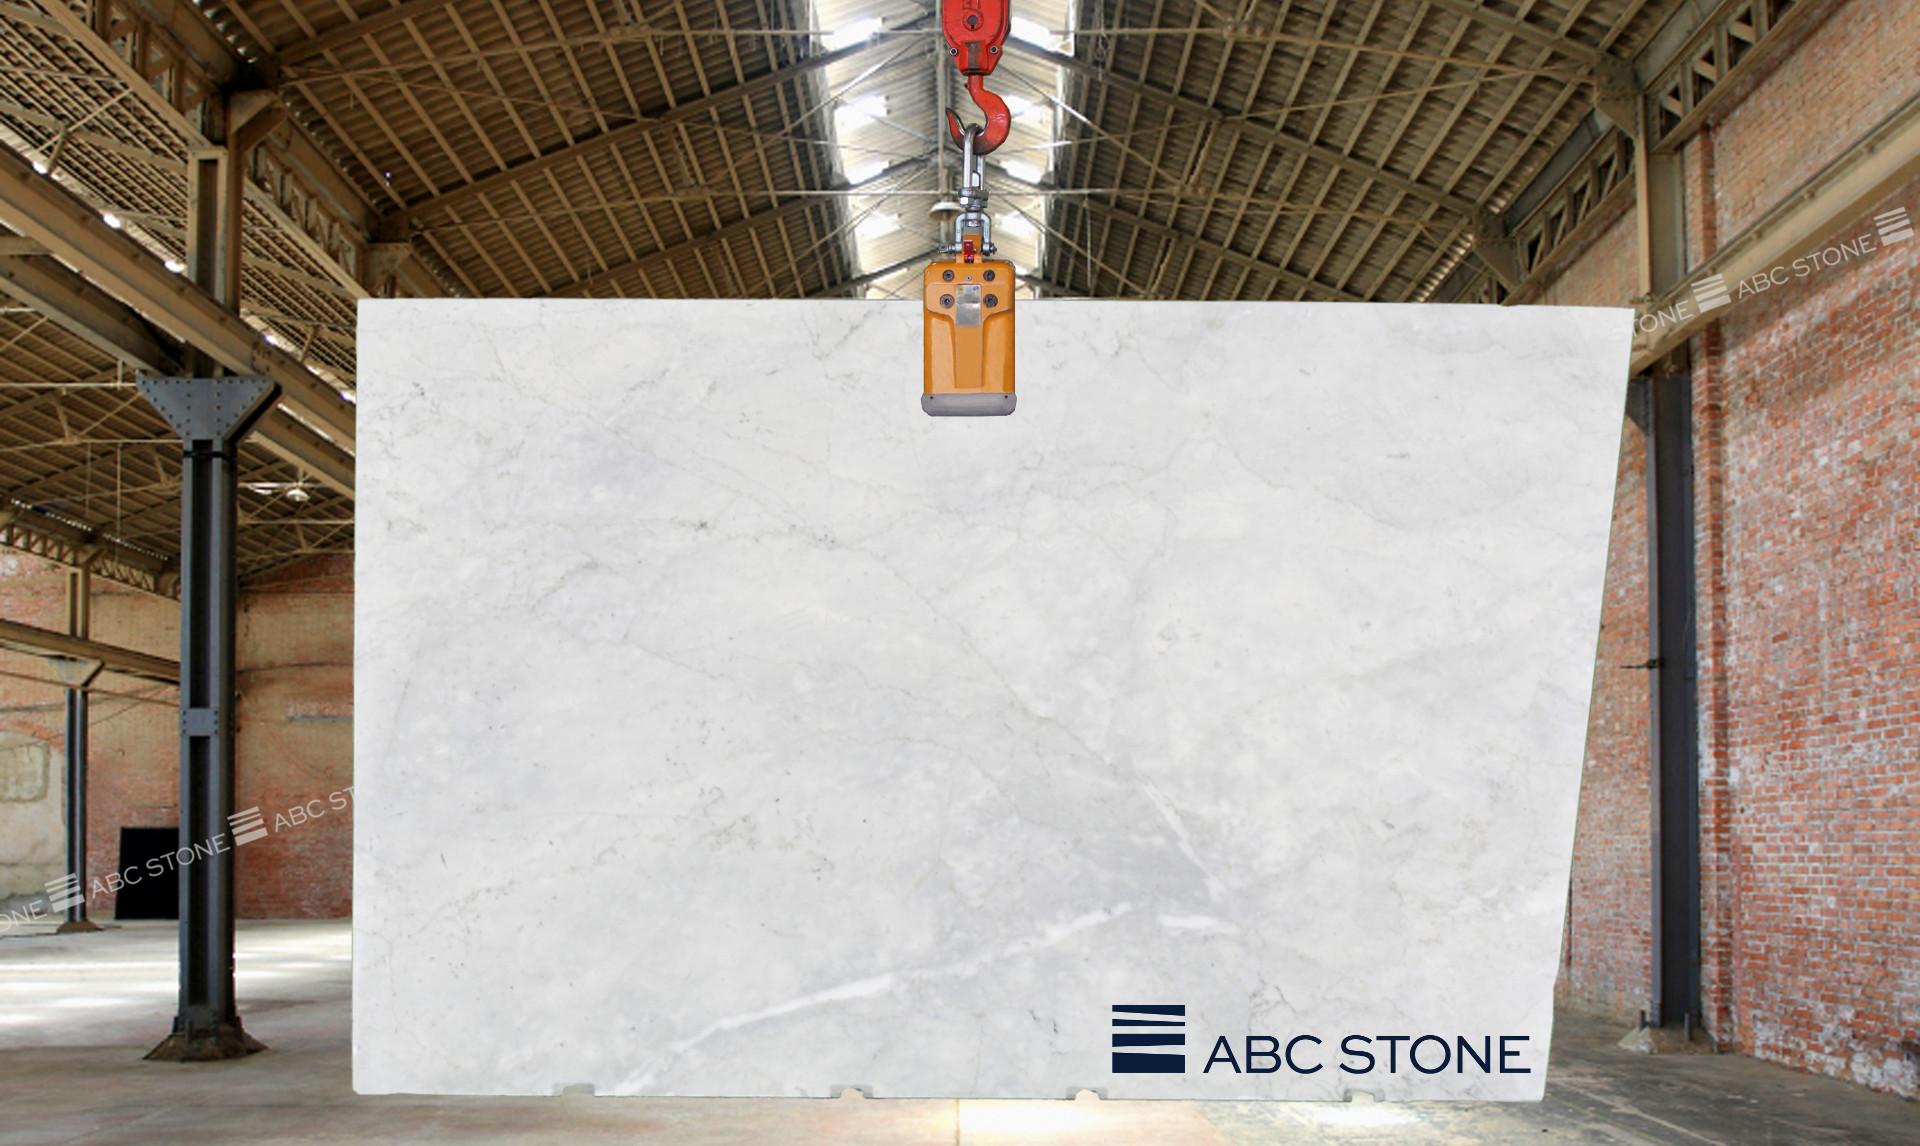 Michelangelo Abc Stone Abc Stone